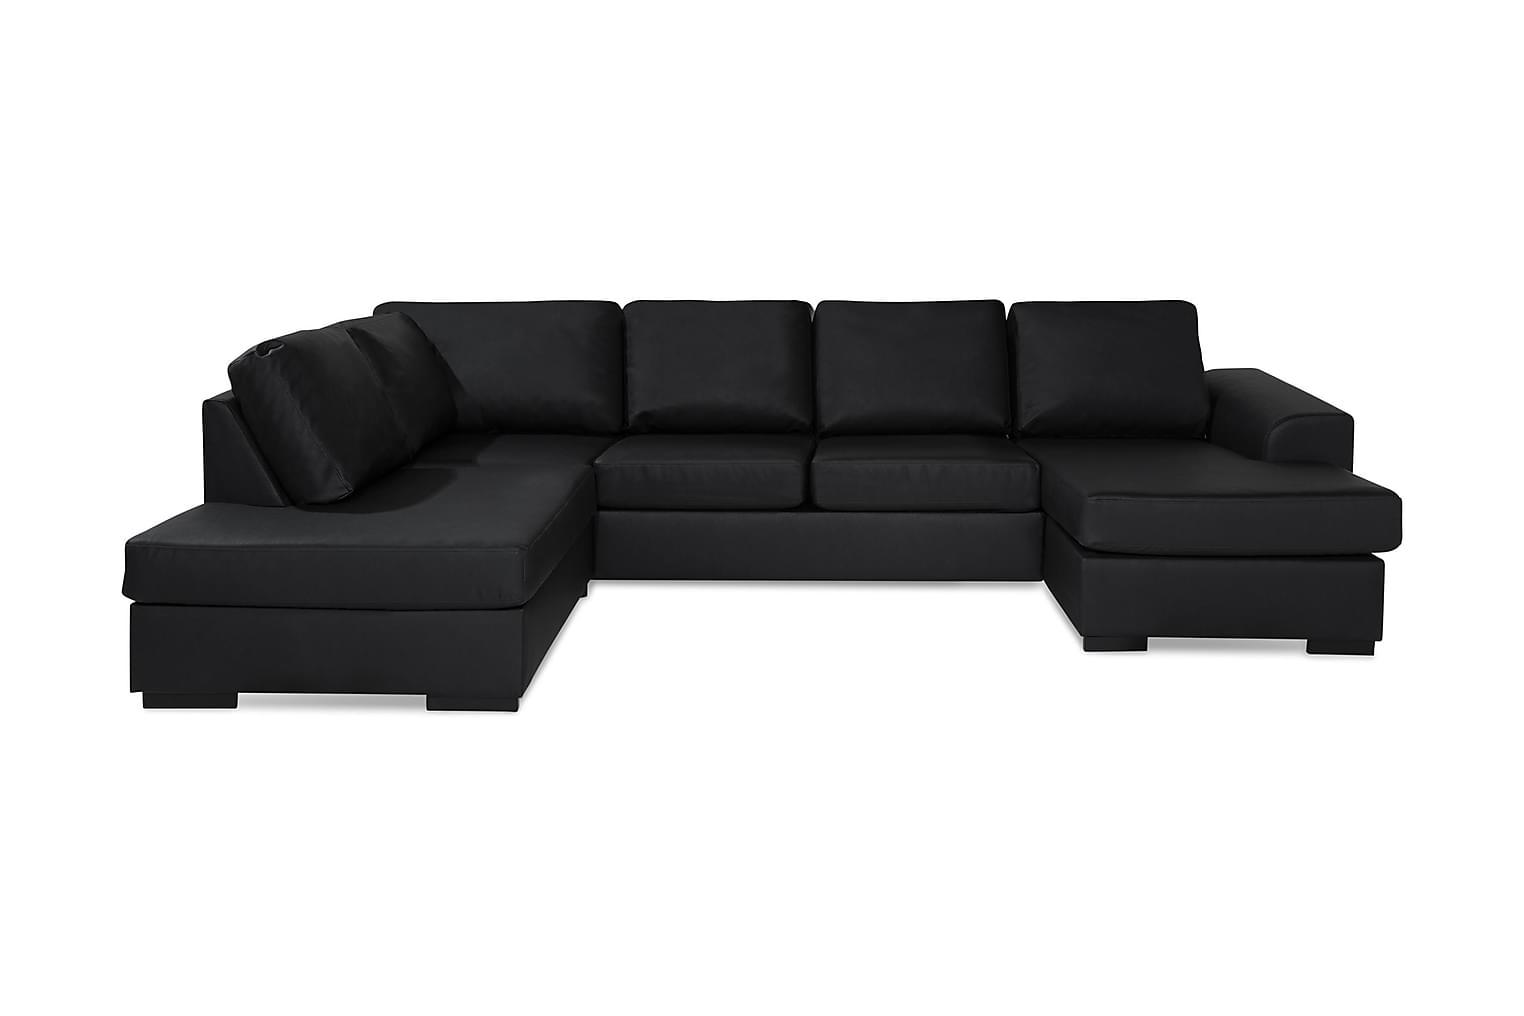 NASHVILLE Large U-sohva Vasen Bonded leather Musta